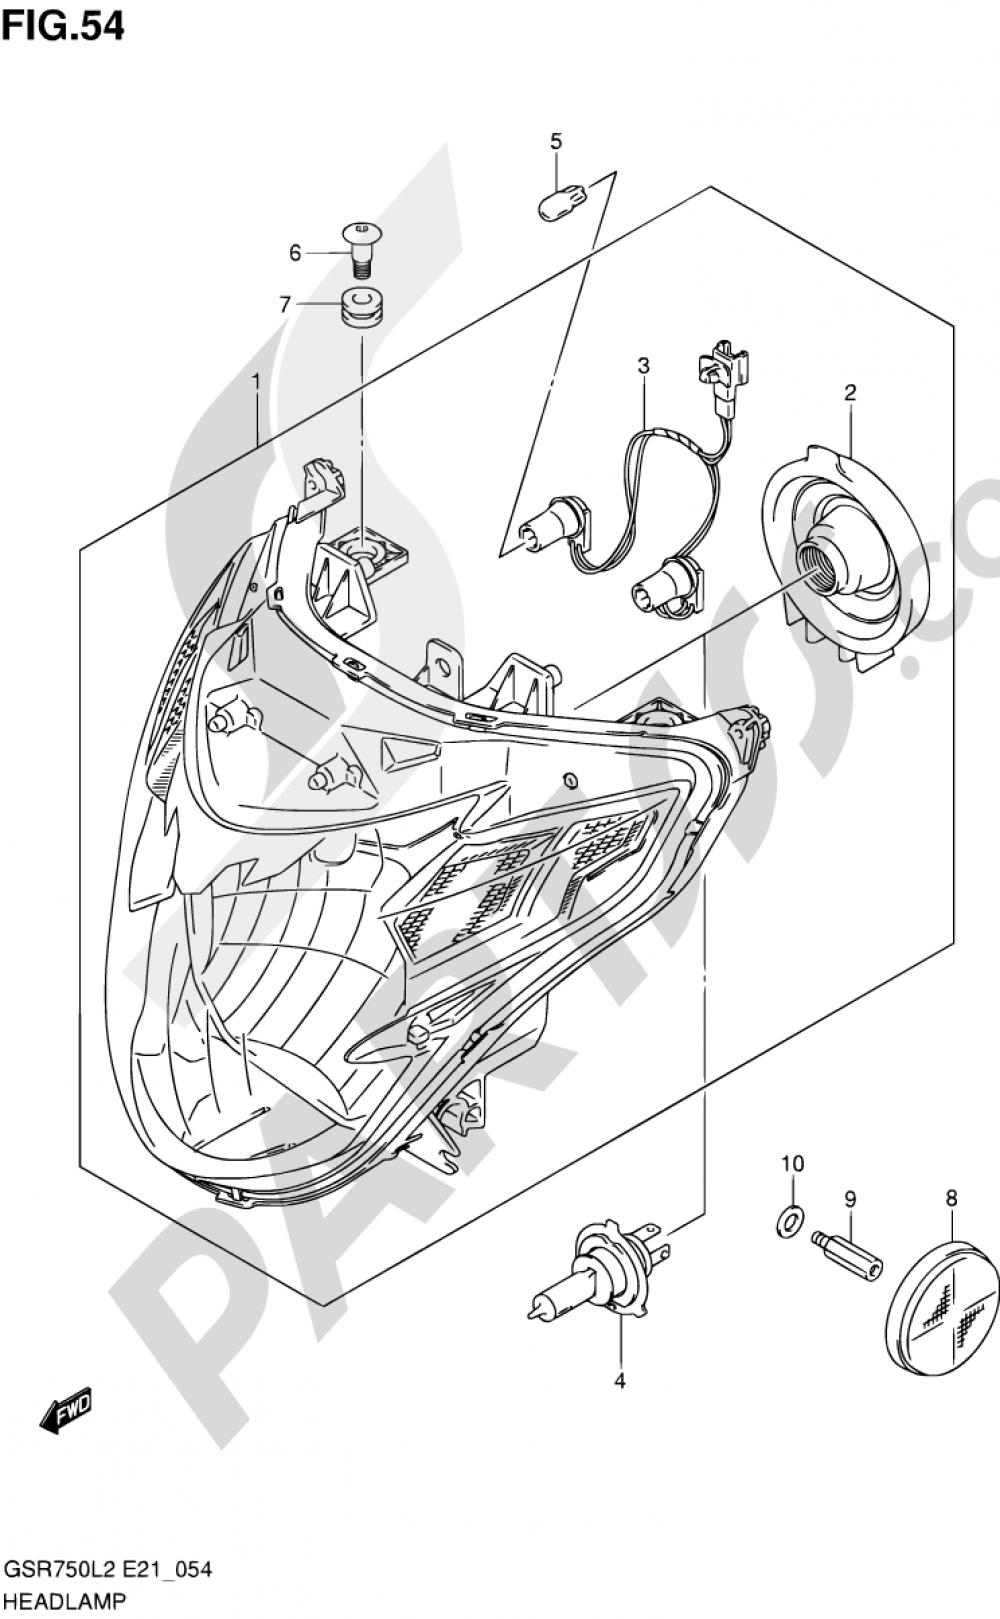 54 - HEADLAMP (GSR750AL2 E24) Suzuki GSR750A 2012